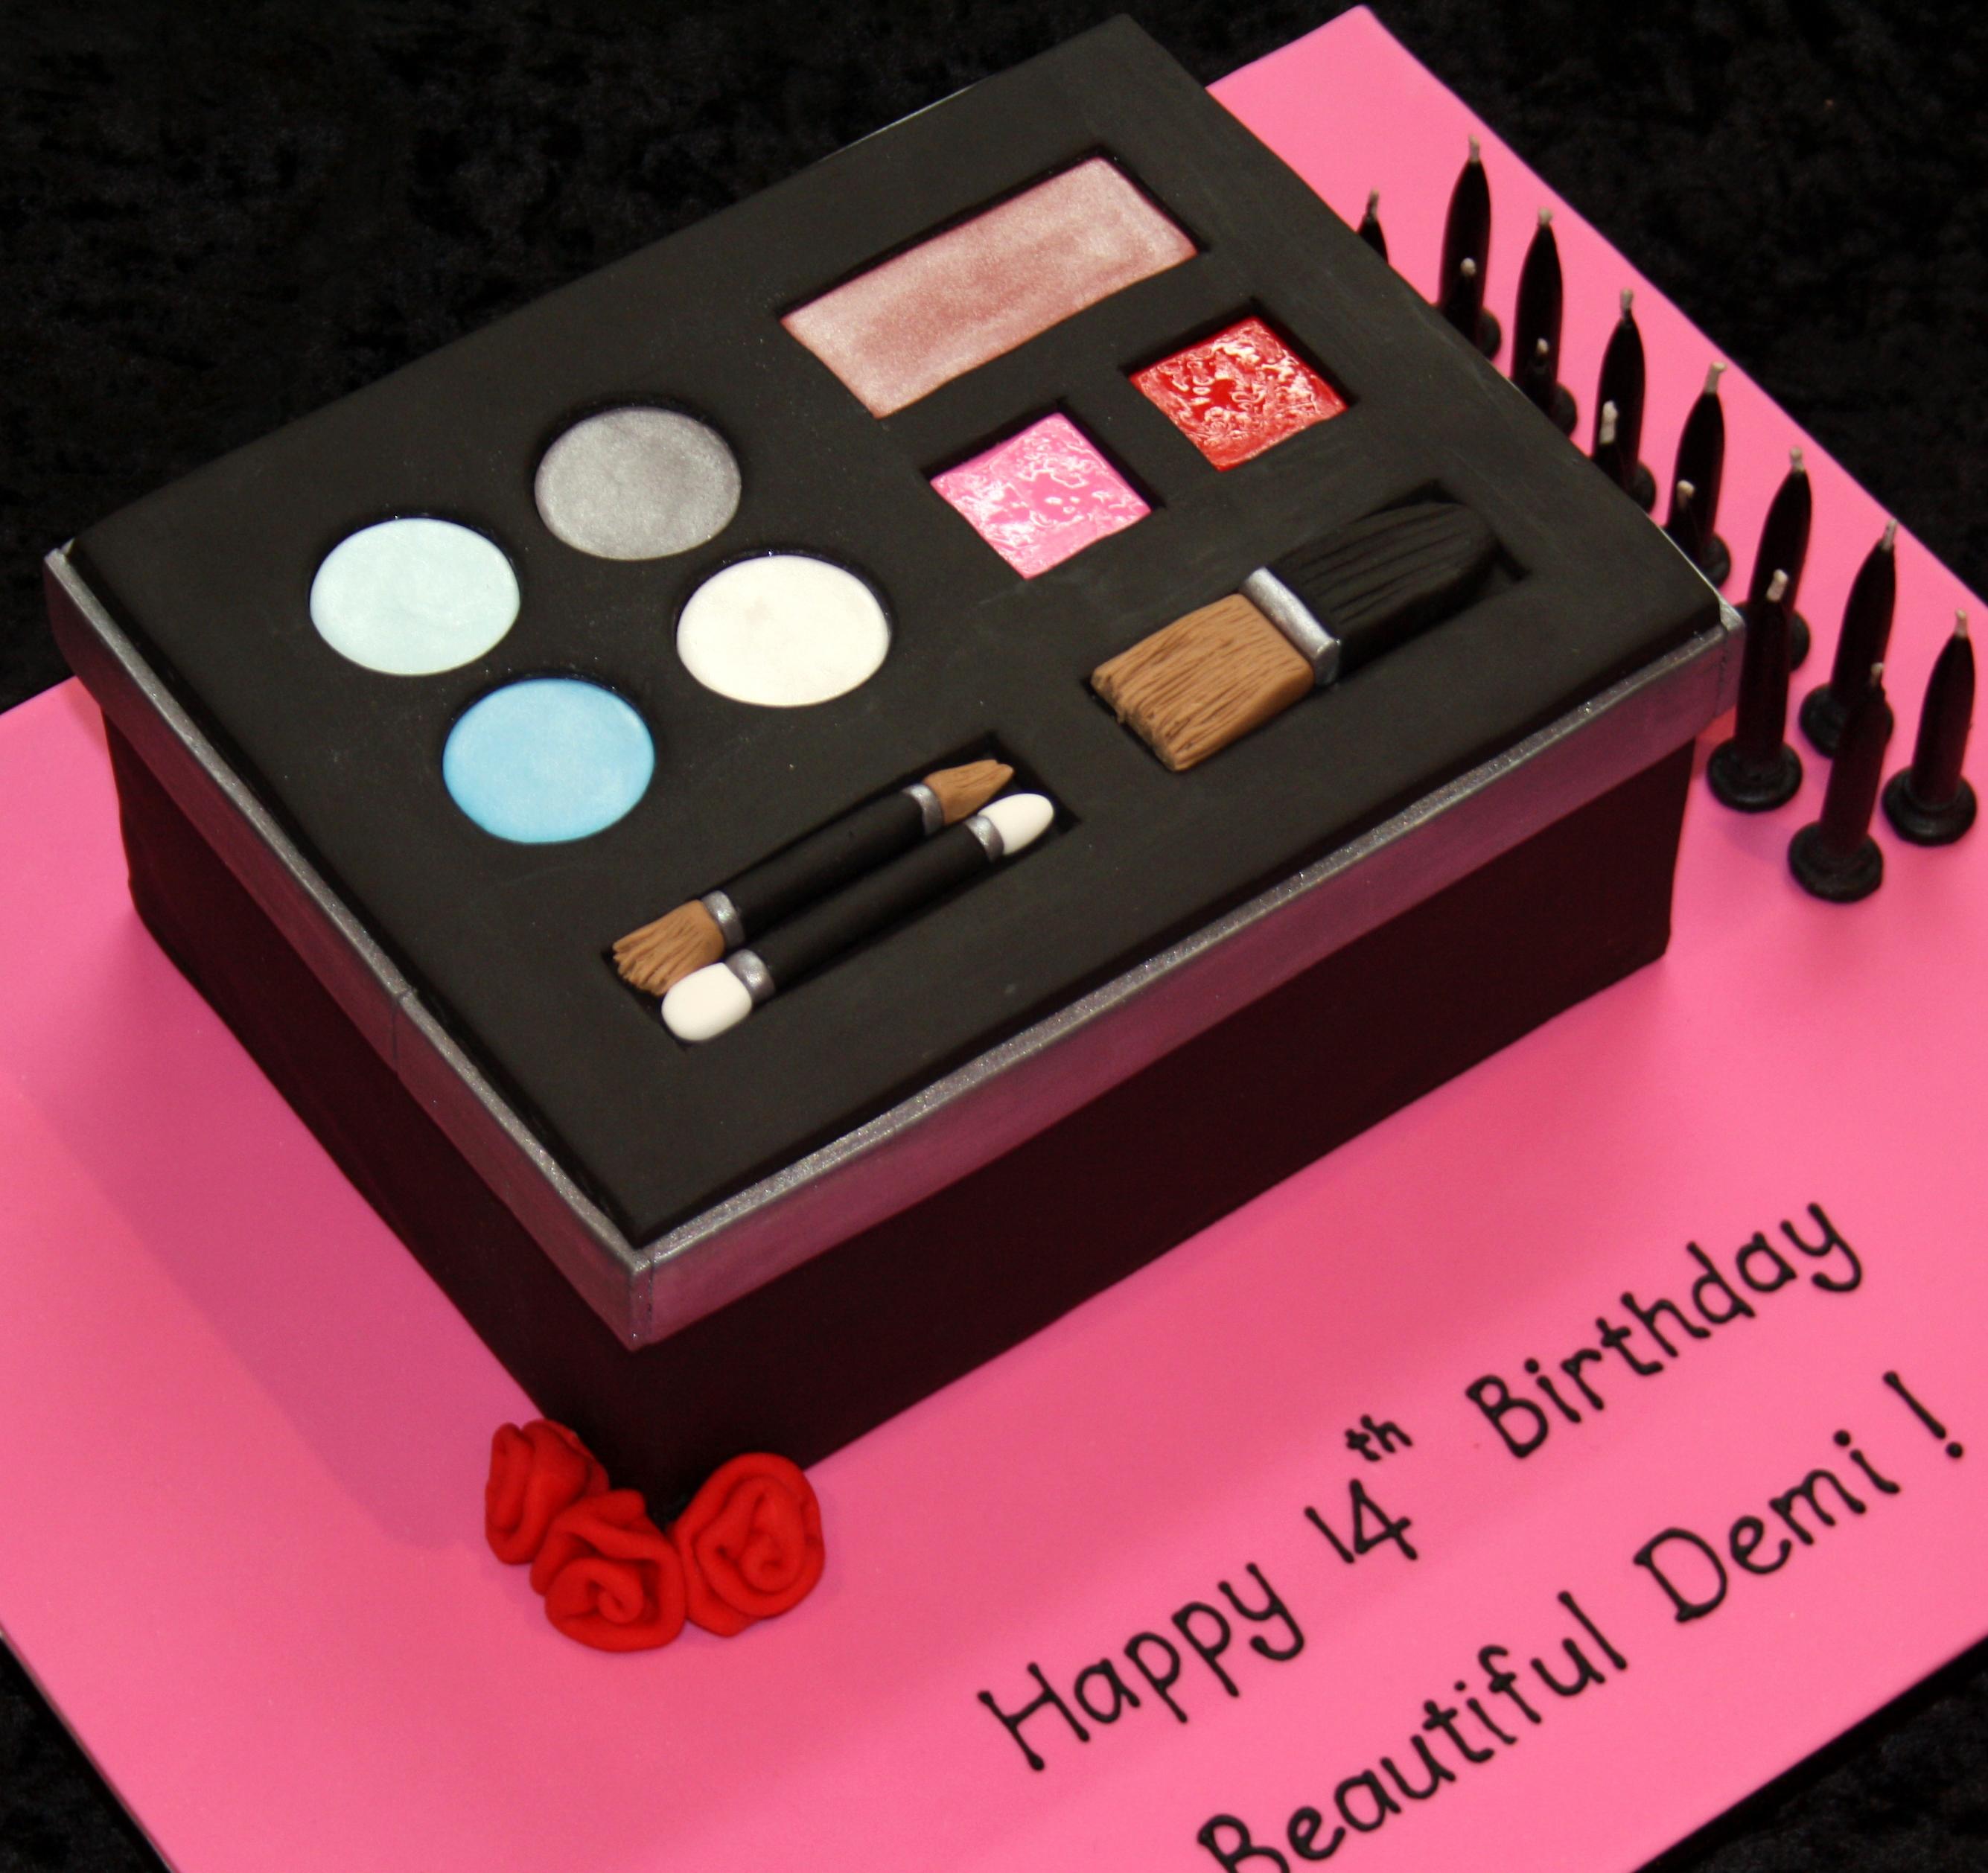 12 14th Birthday Cupcake Cakes Photo 14th Birthday Cake 14th